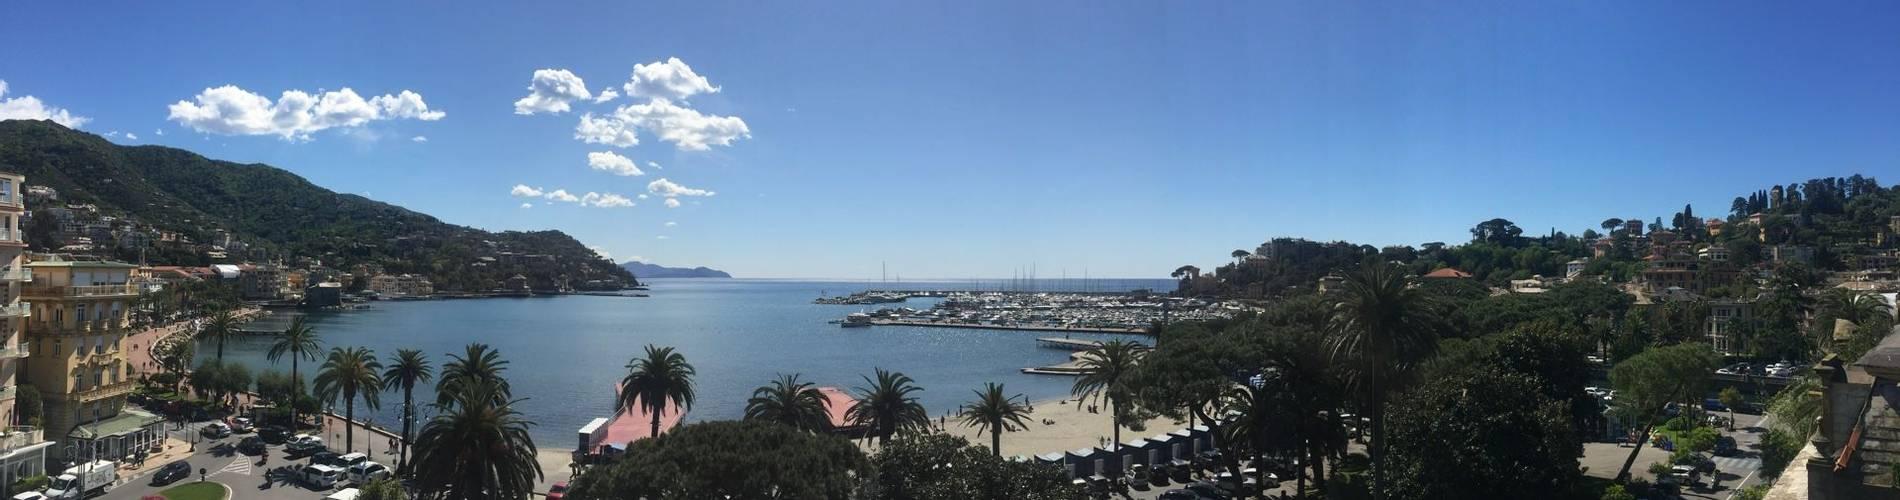 hotel_astoria_rapallo_panorama.JPG